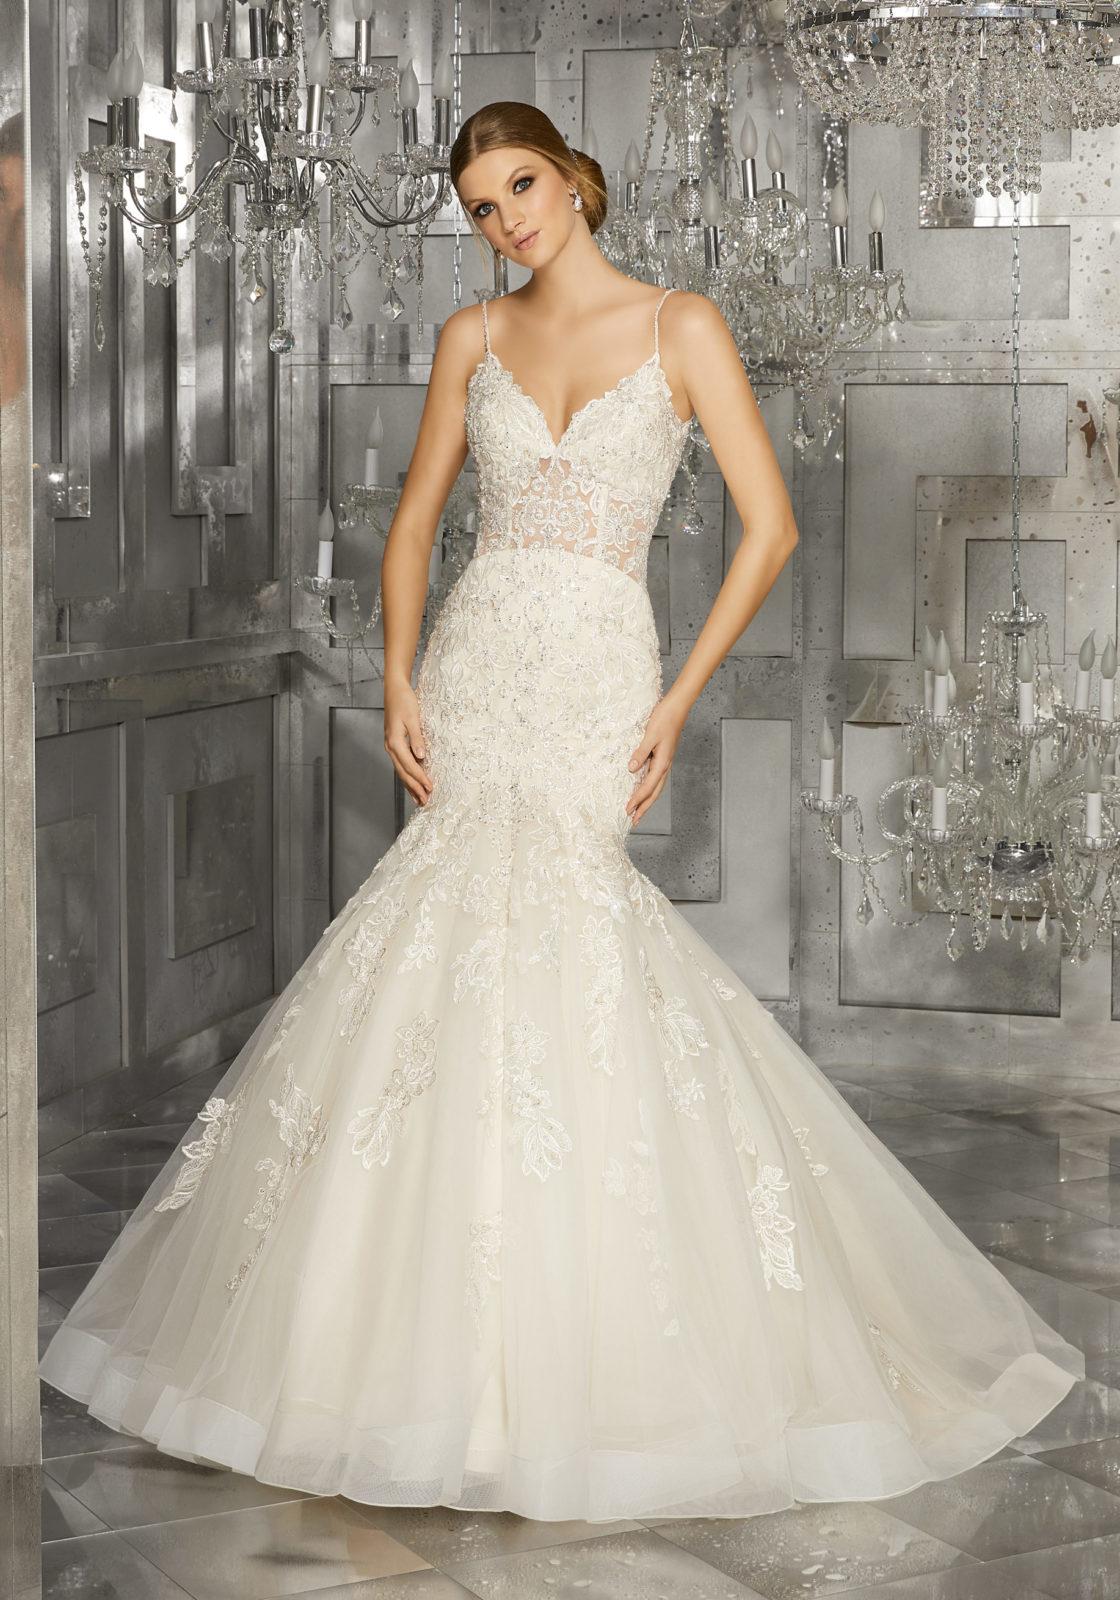 wedding dresses with photo - 1